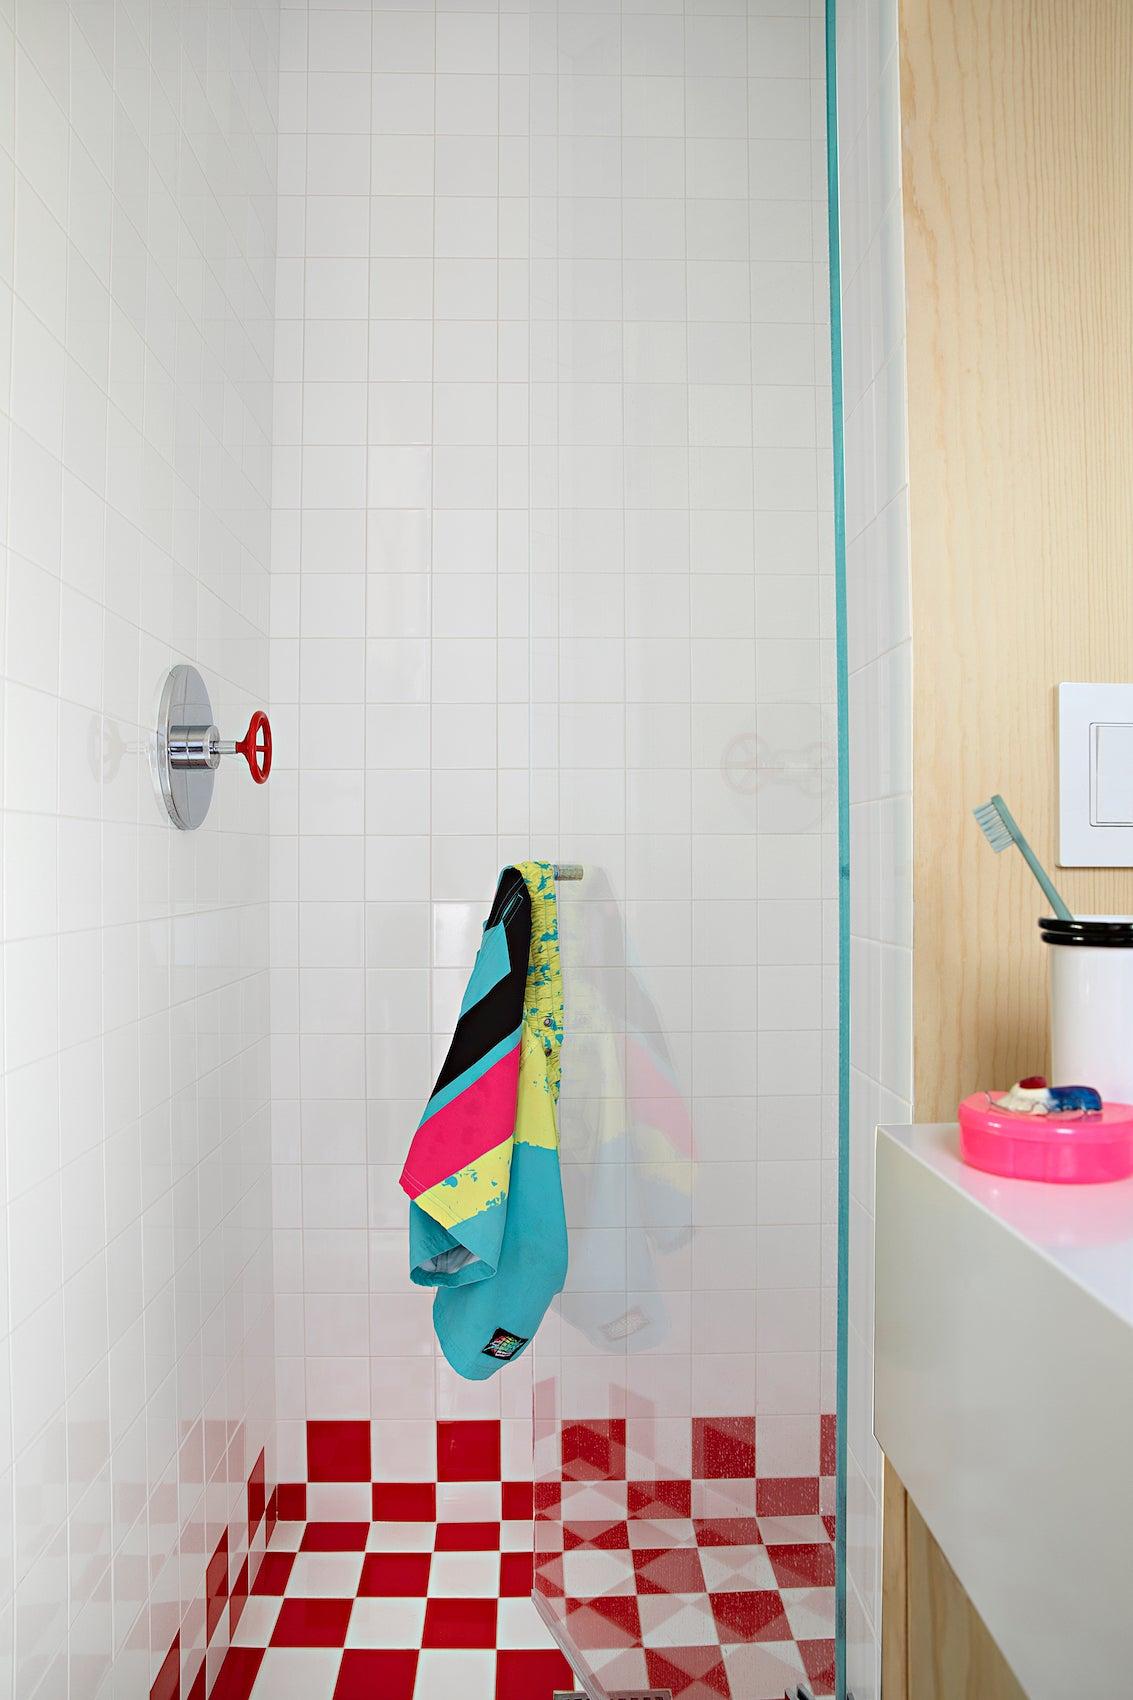 chekcered shower tiles